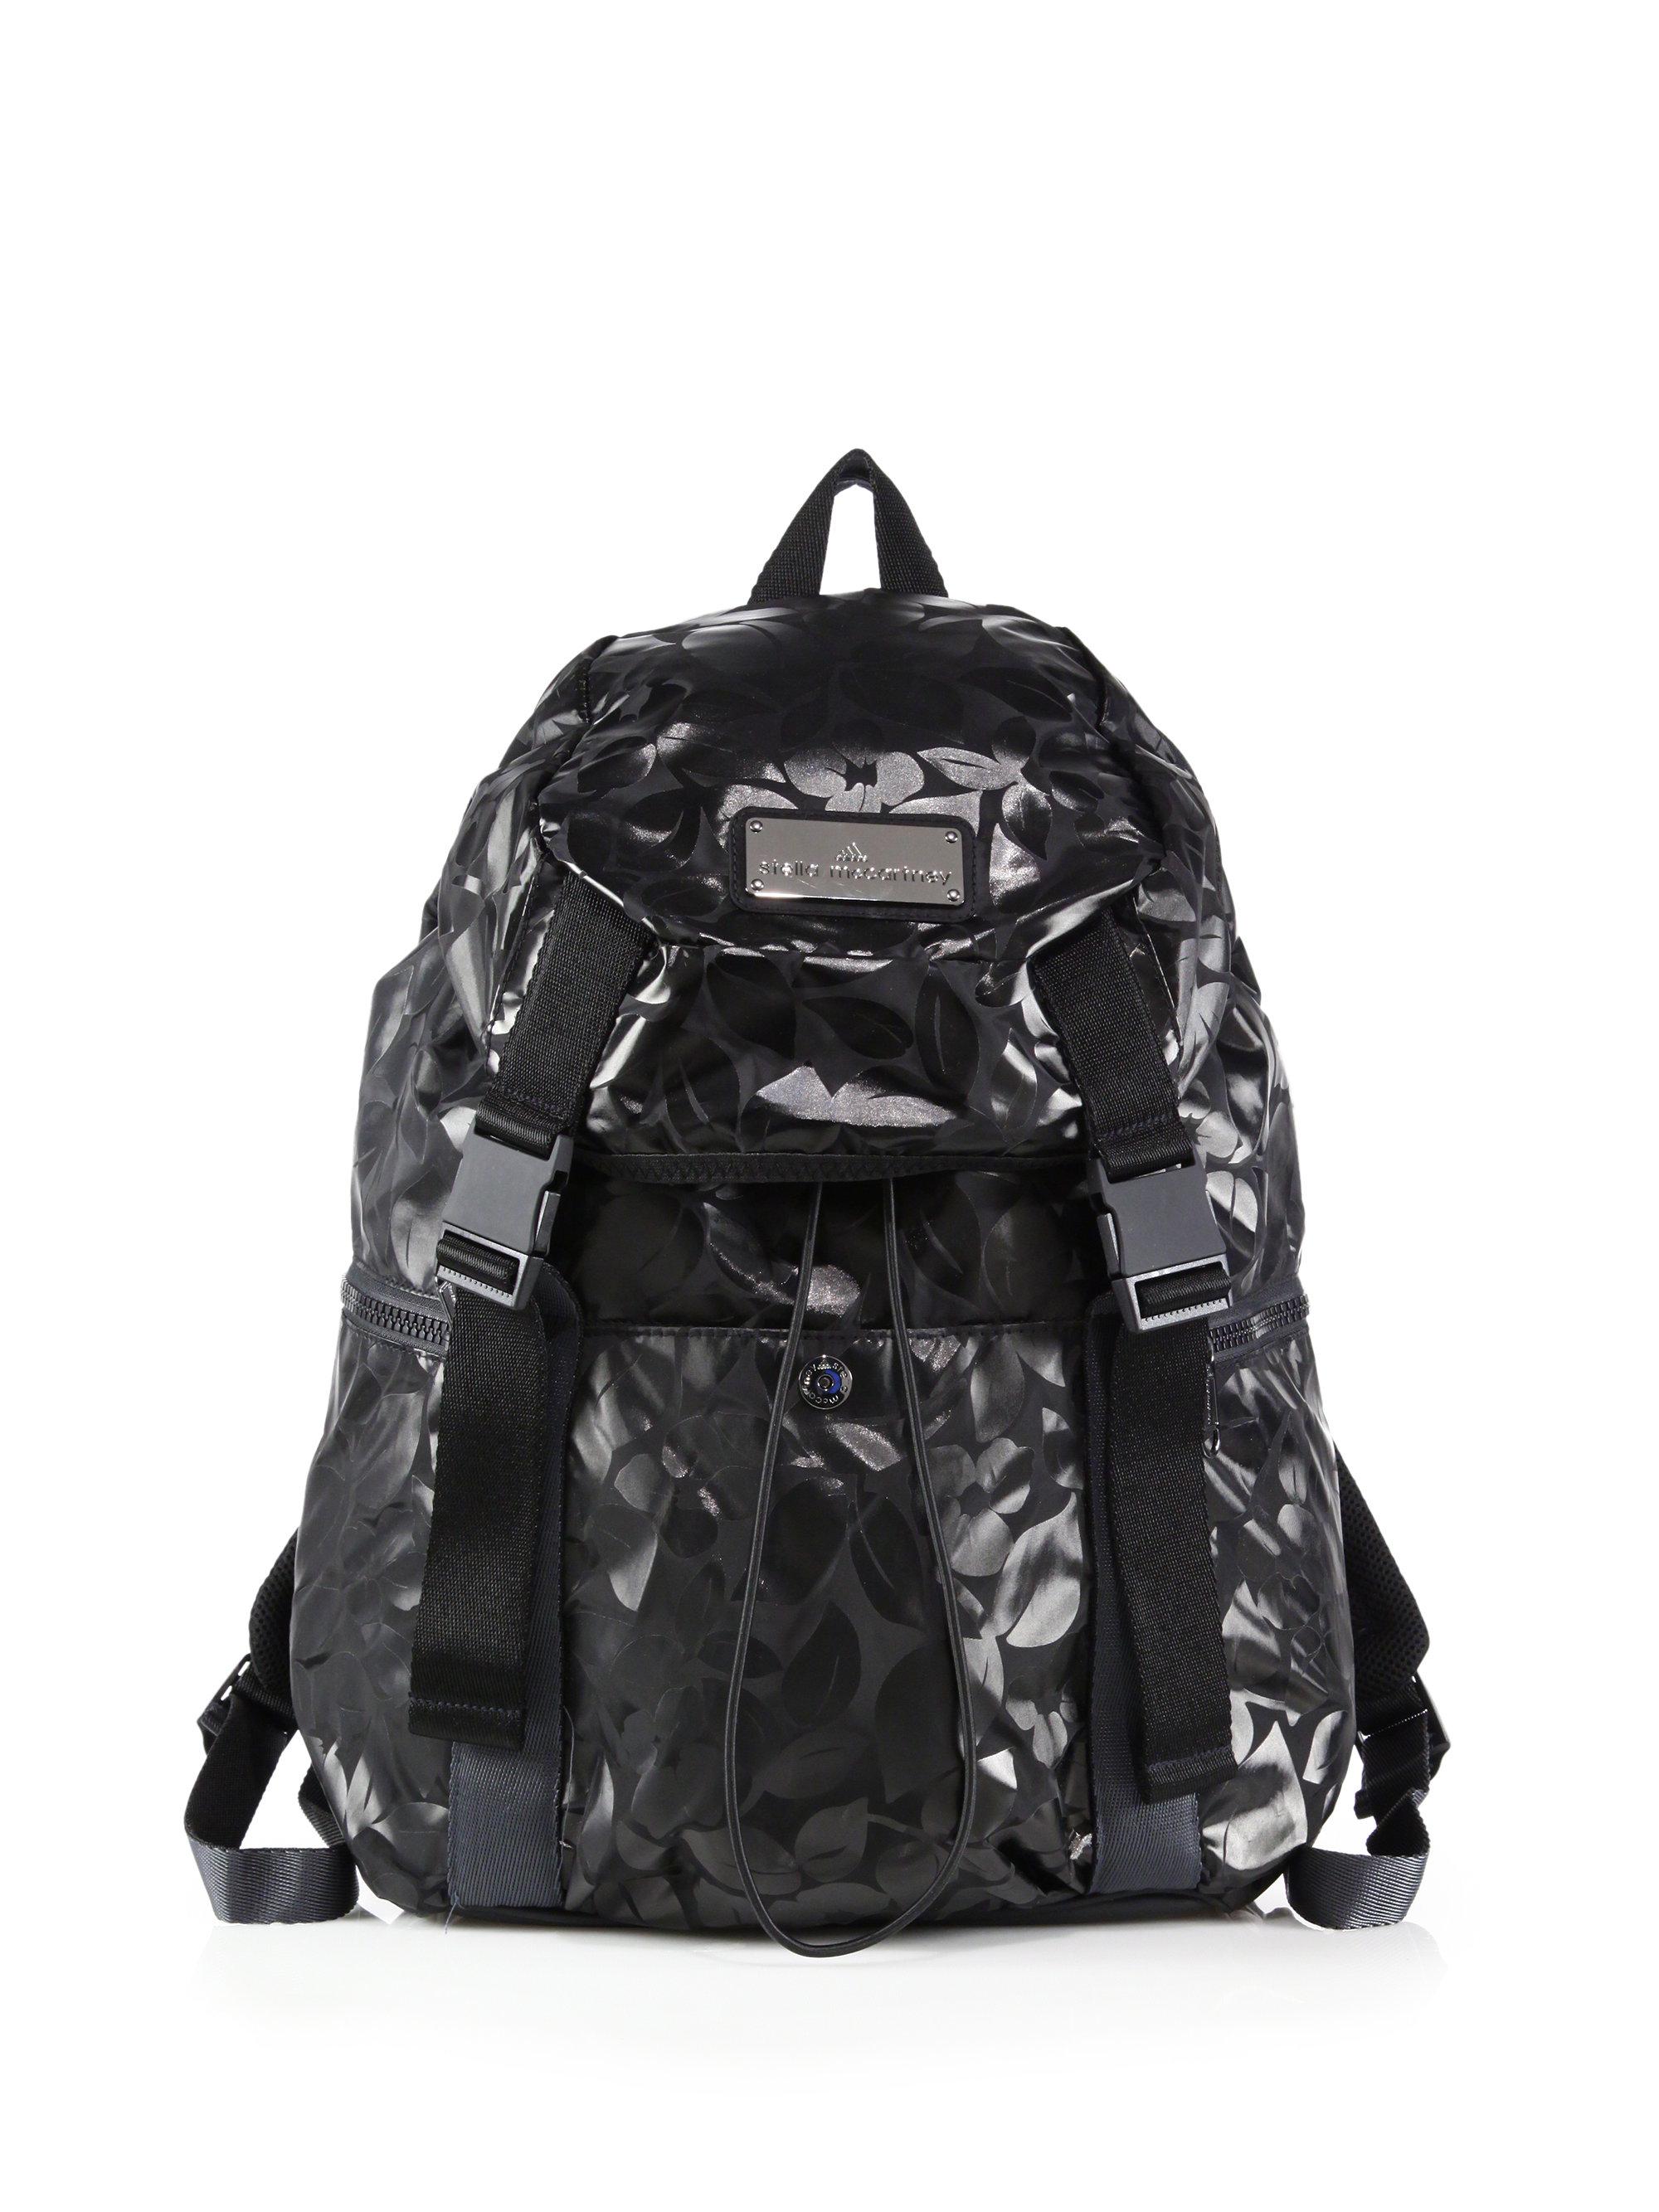 a9066970494a Lyst - adidas By Stella McCartney Printed Weekender Backpack in Black